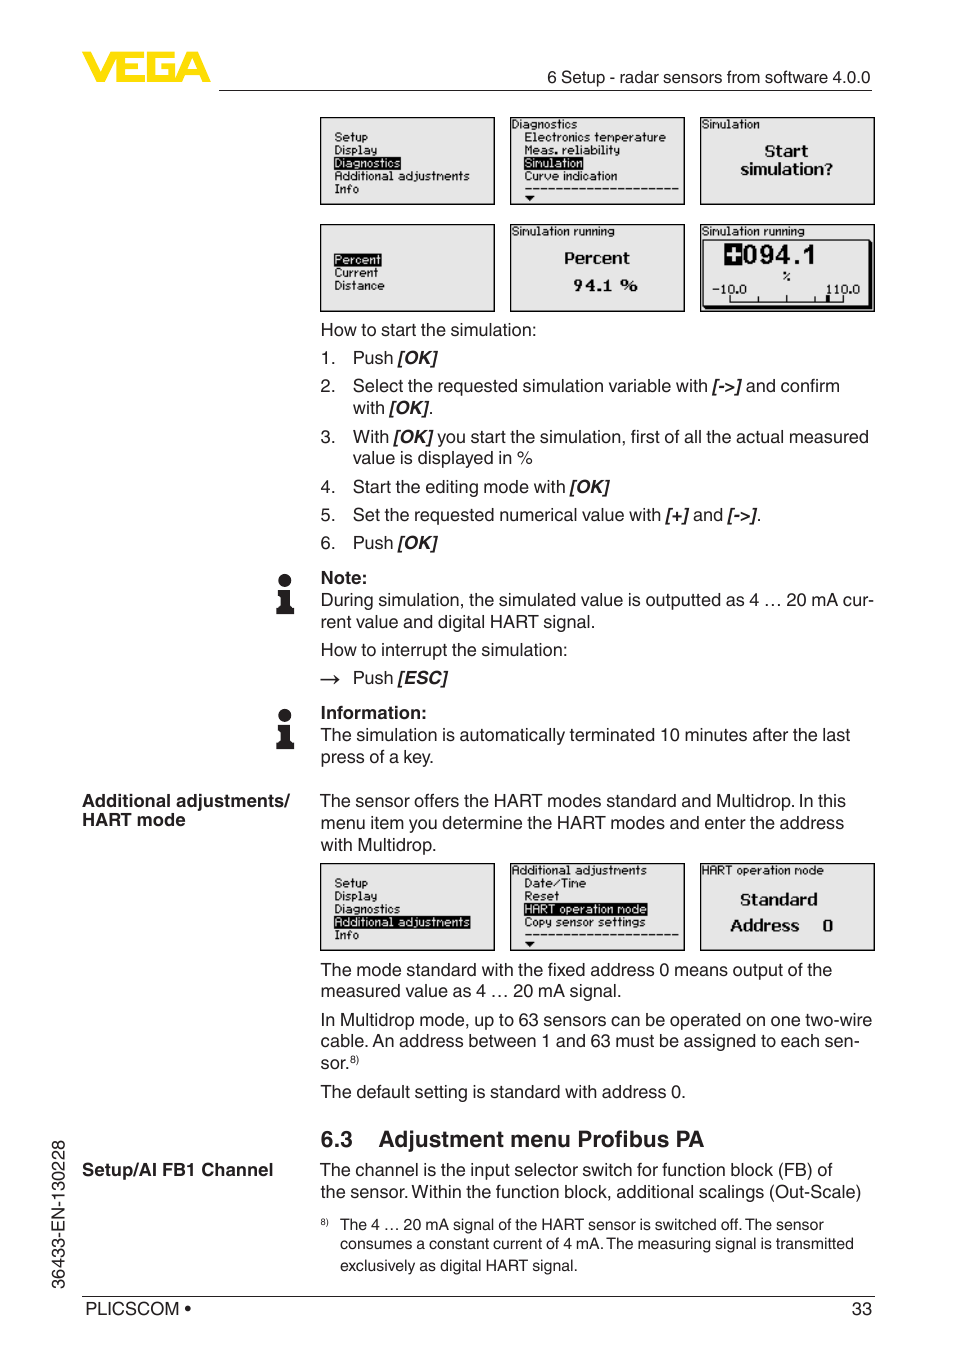 3 adjustment menu profibus pa   VEGA PLICSCOM User Manual